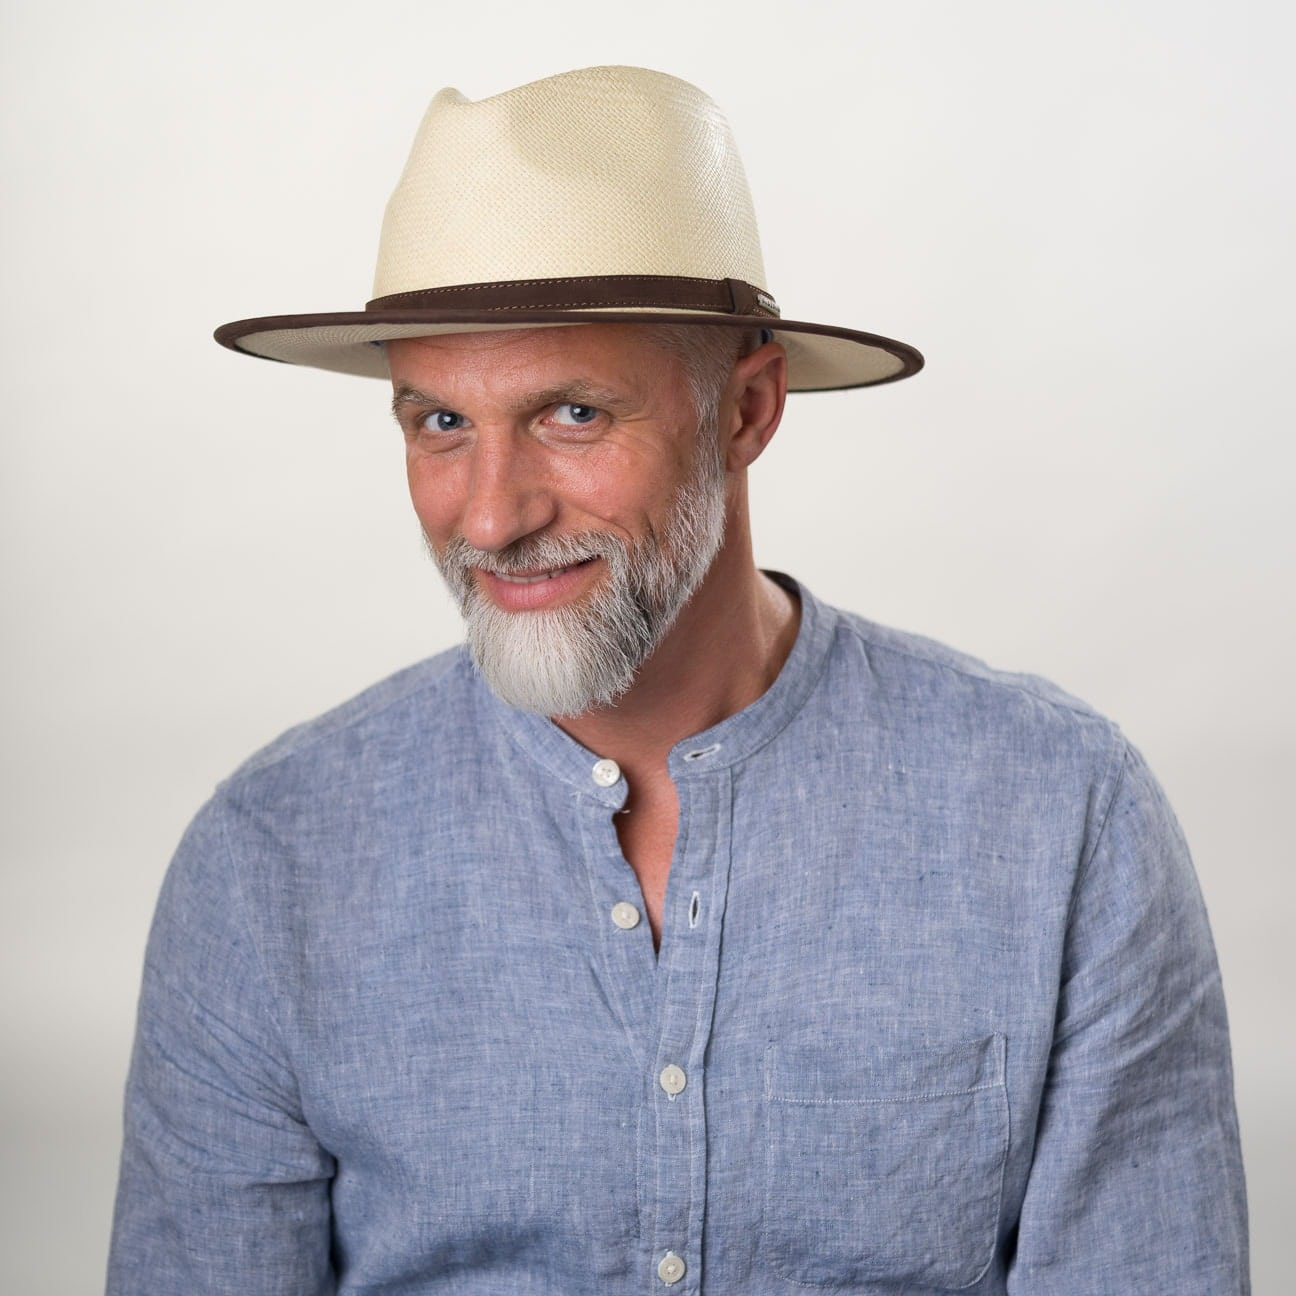 Sombrero Panama Braid by Stetson - Sombreros - sombreroshop.es c338b5d0d4e